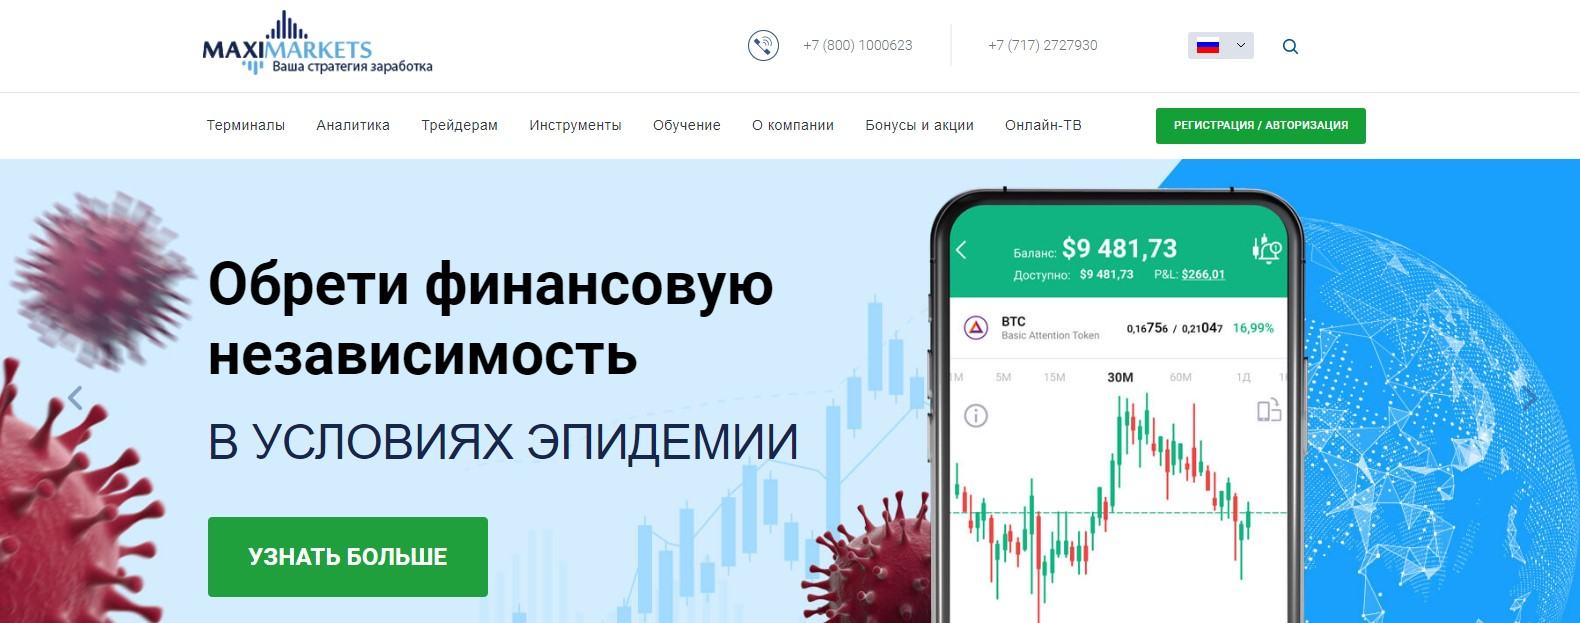 MaxiMarkets  отзывы и обзор 2020